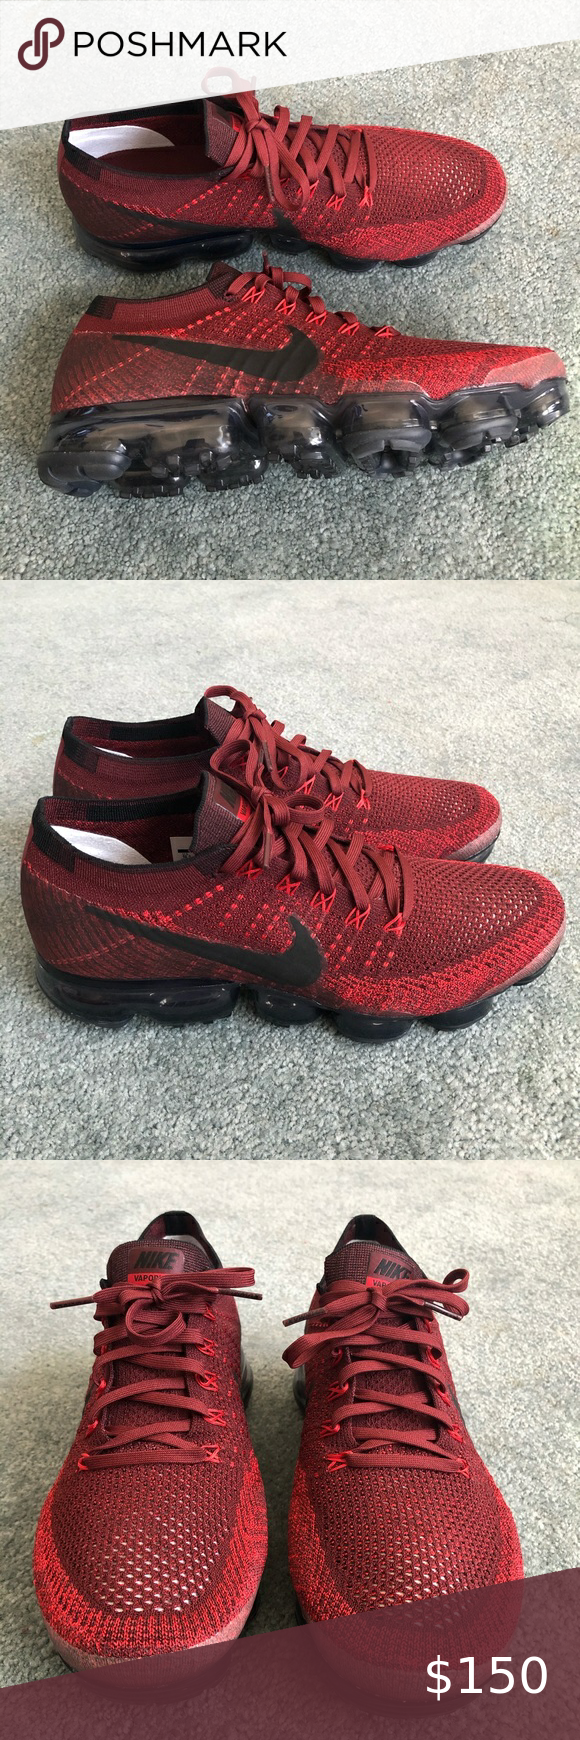 Nike Vapormax Flyknit Dark Team Red Black In 2020 Nike Vapormax Flyknit Black And Red Black Nikes